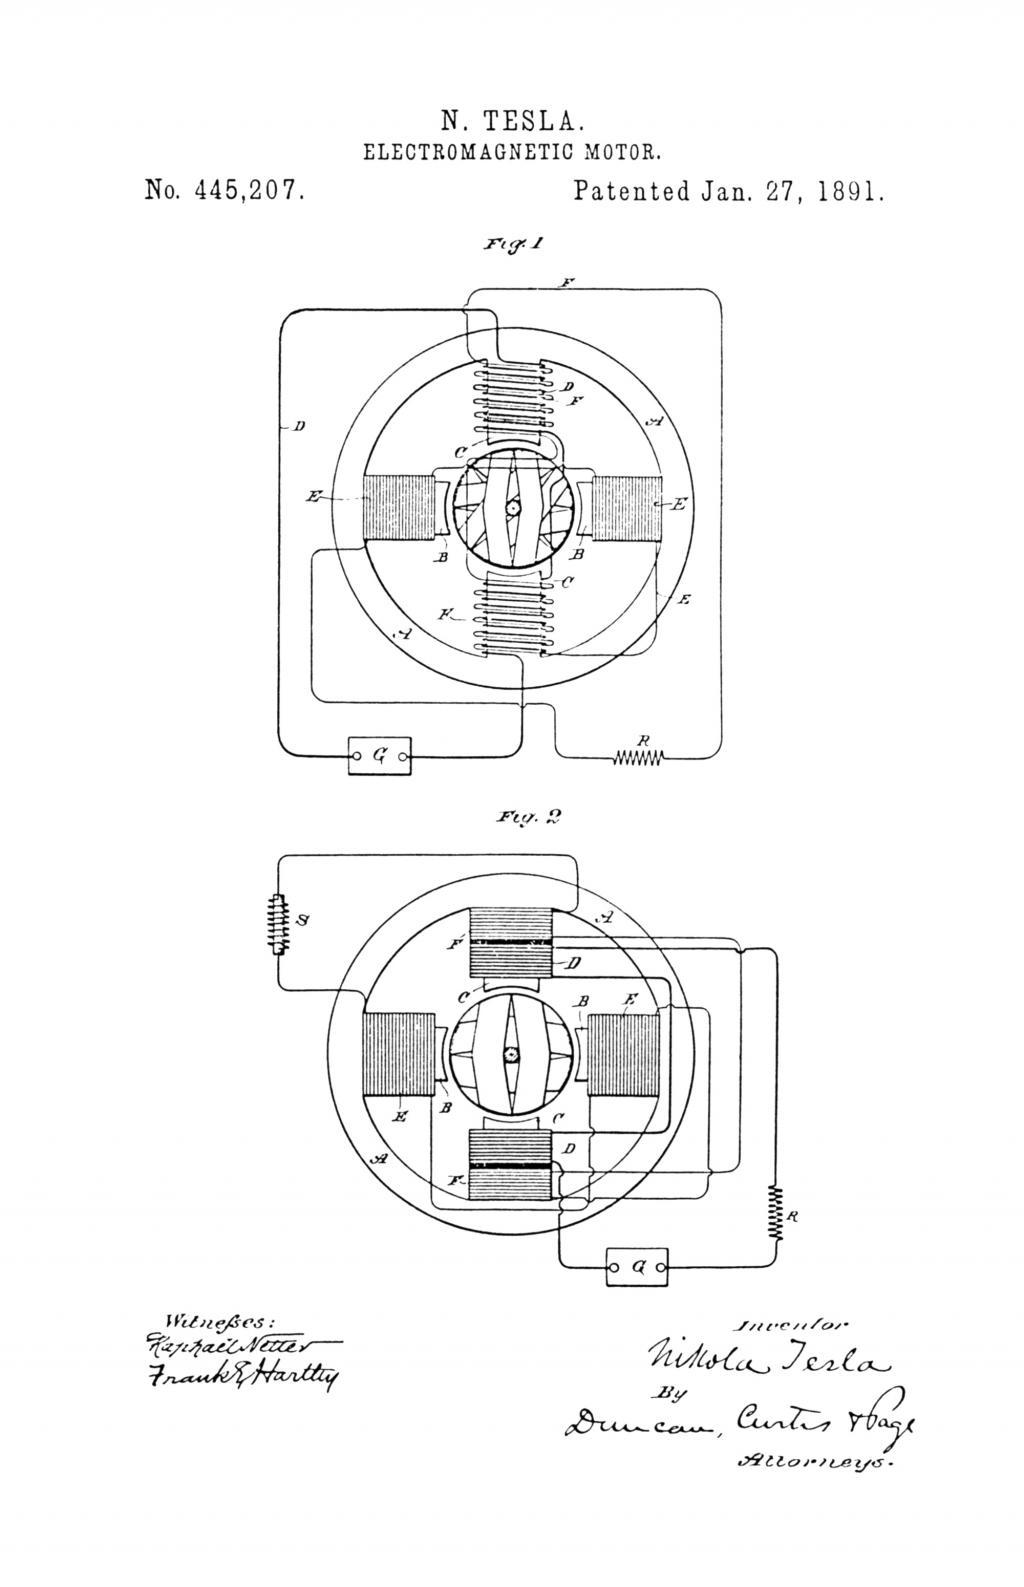 small resolution of nikola tesla u s patent 445 207 electro magnetic motor